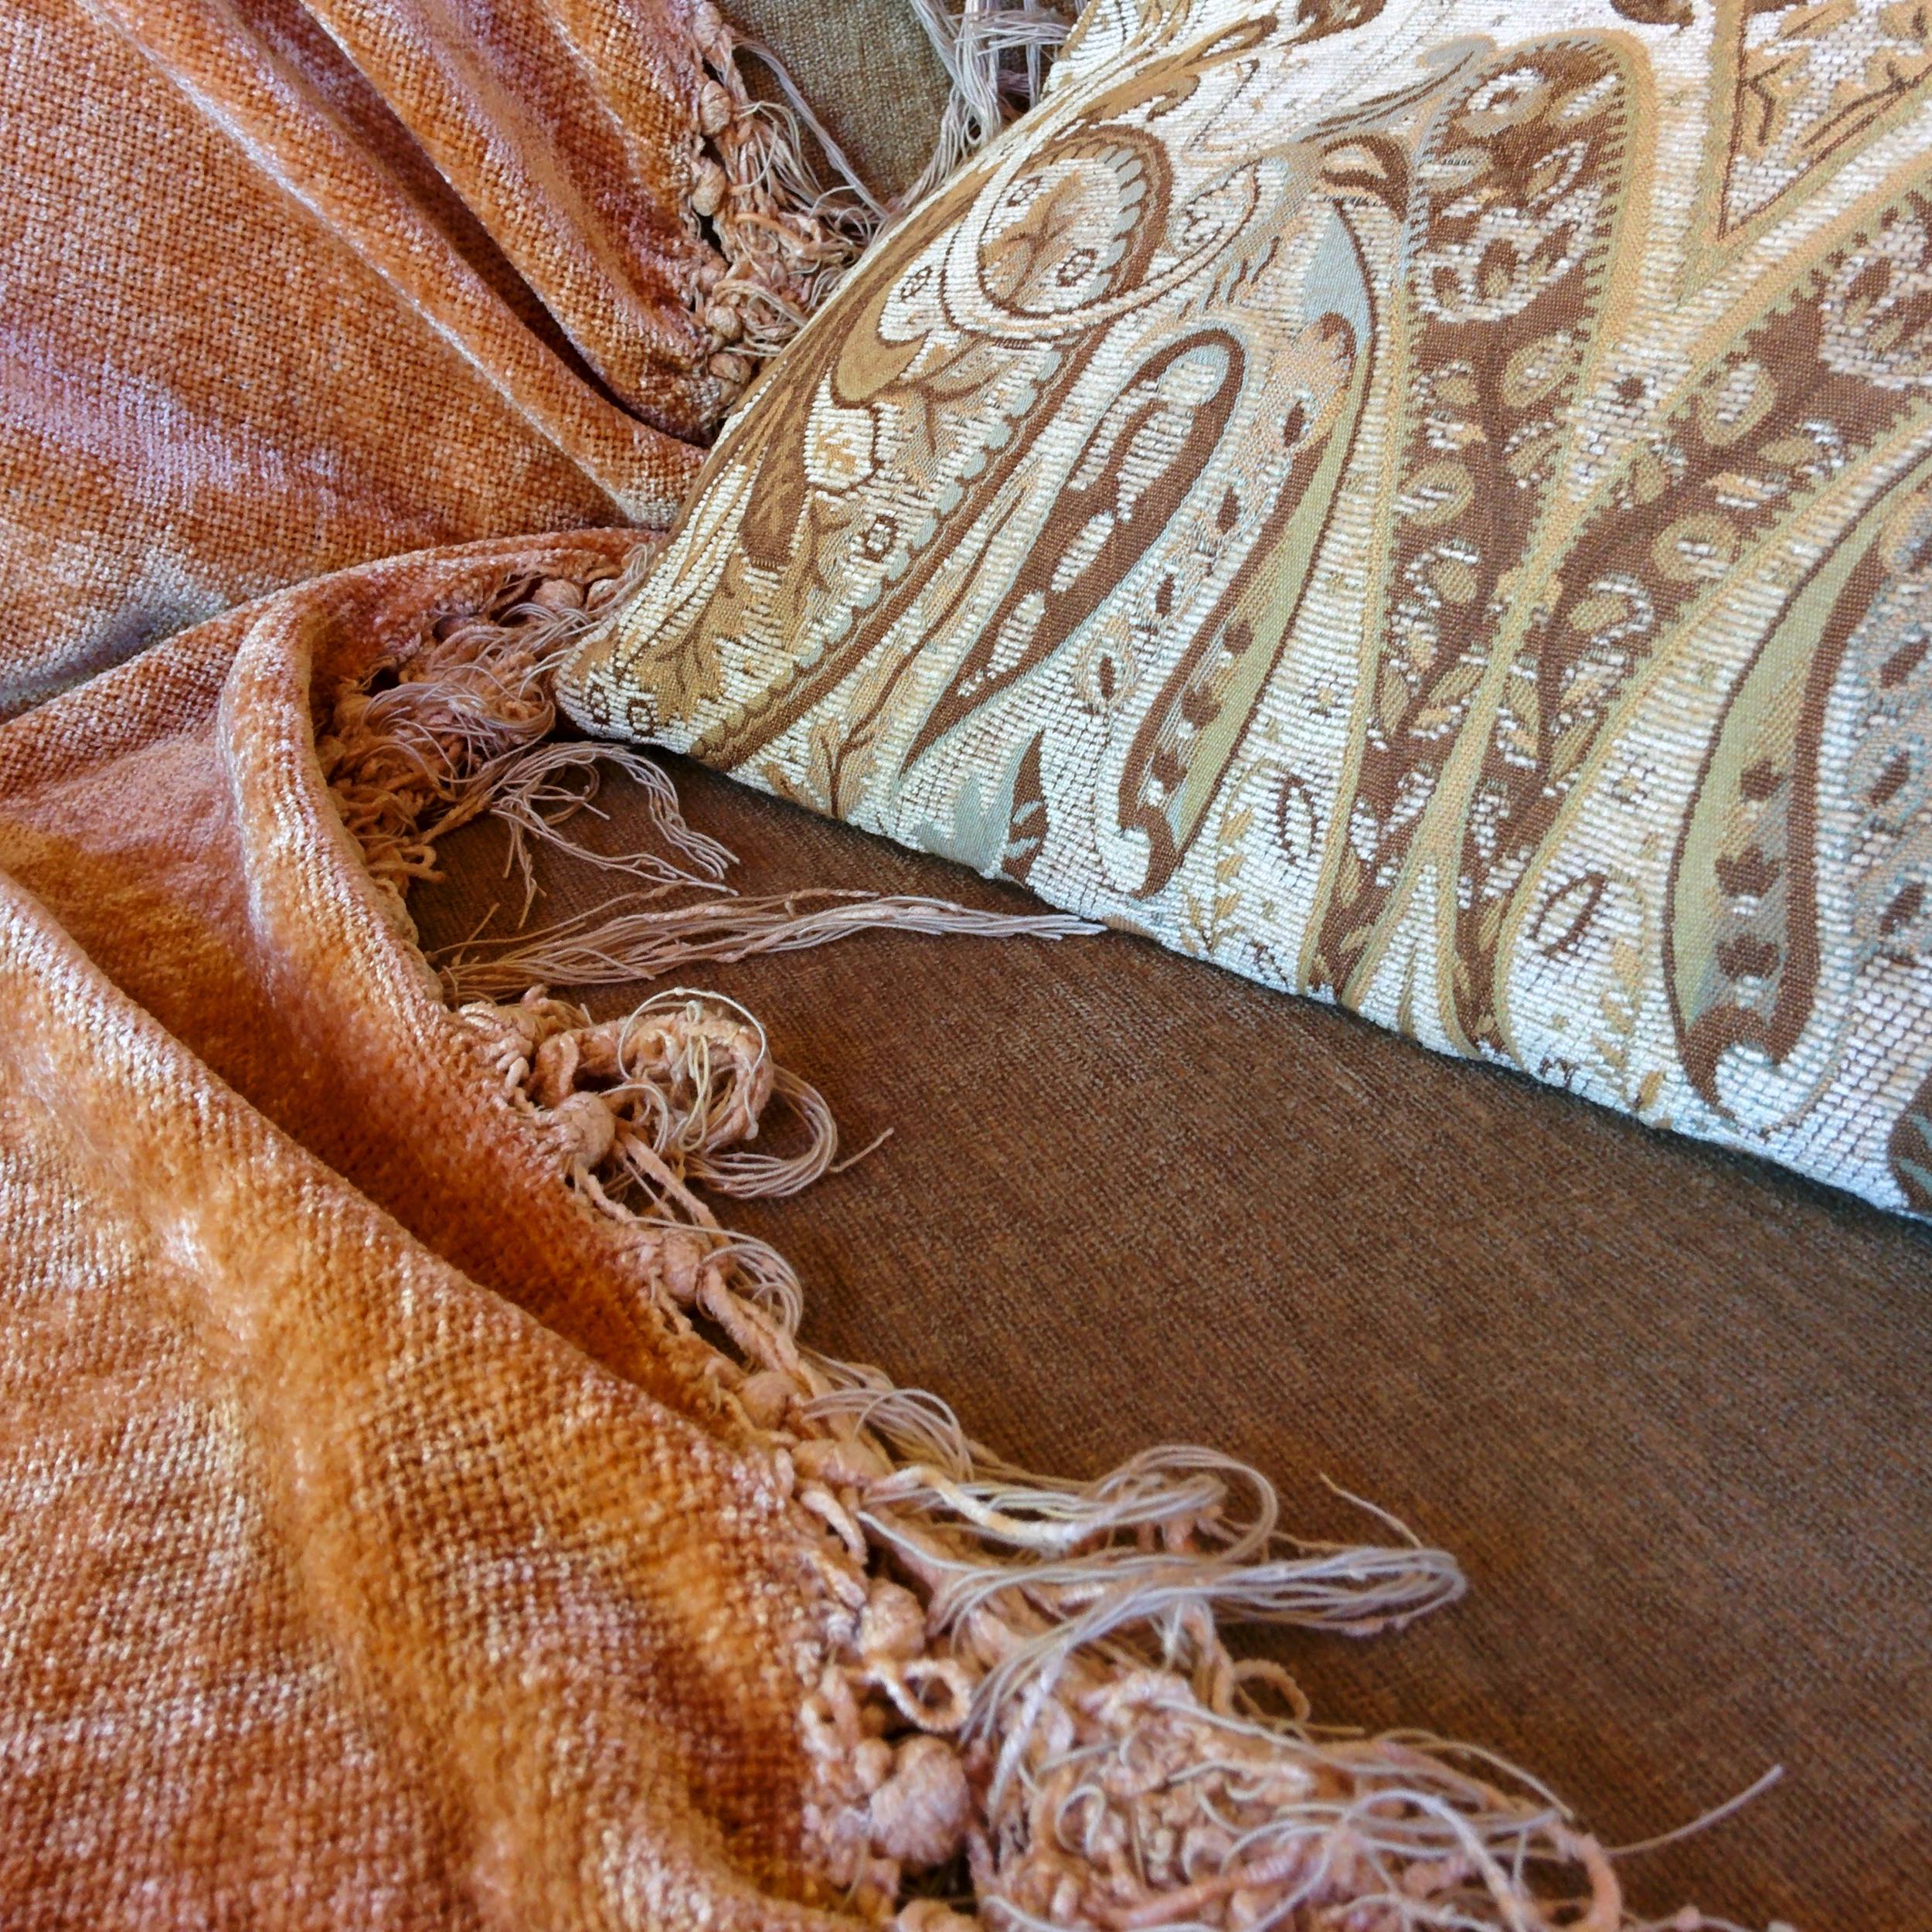 Pillow and Velvet Throw on Sofa